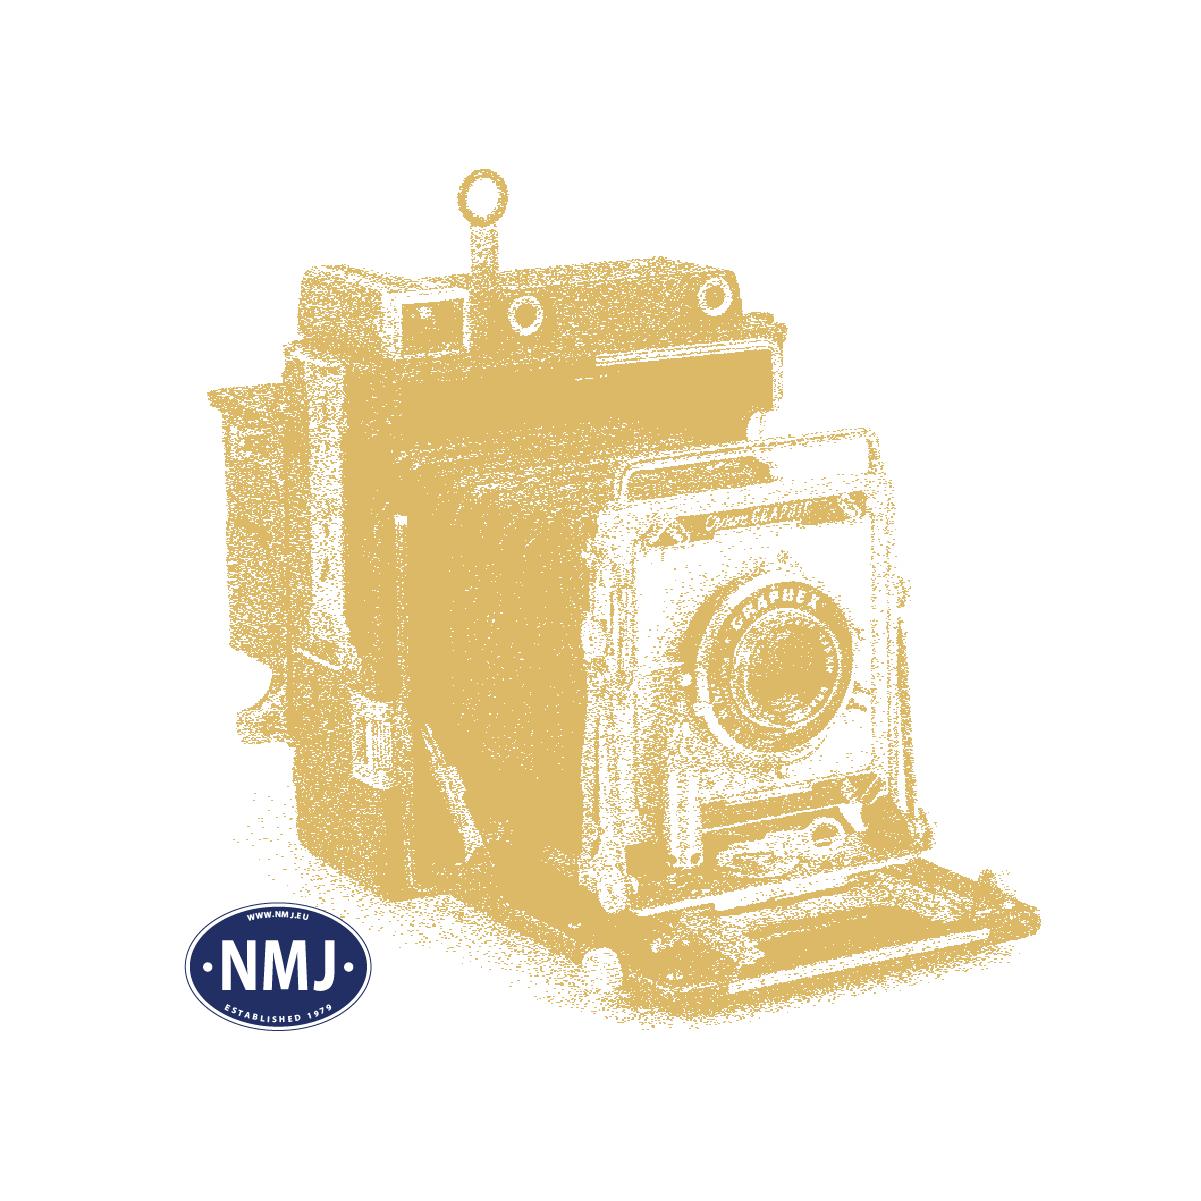 NMJT80.203 - NMJ Topline NSB EL17.2231 rot/schwarz, DC